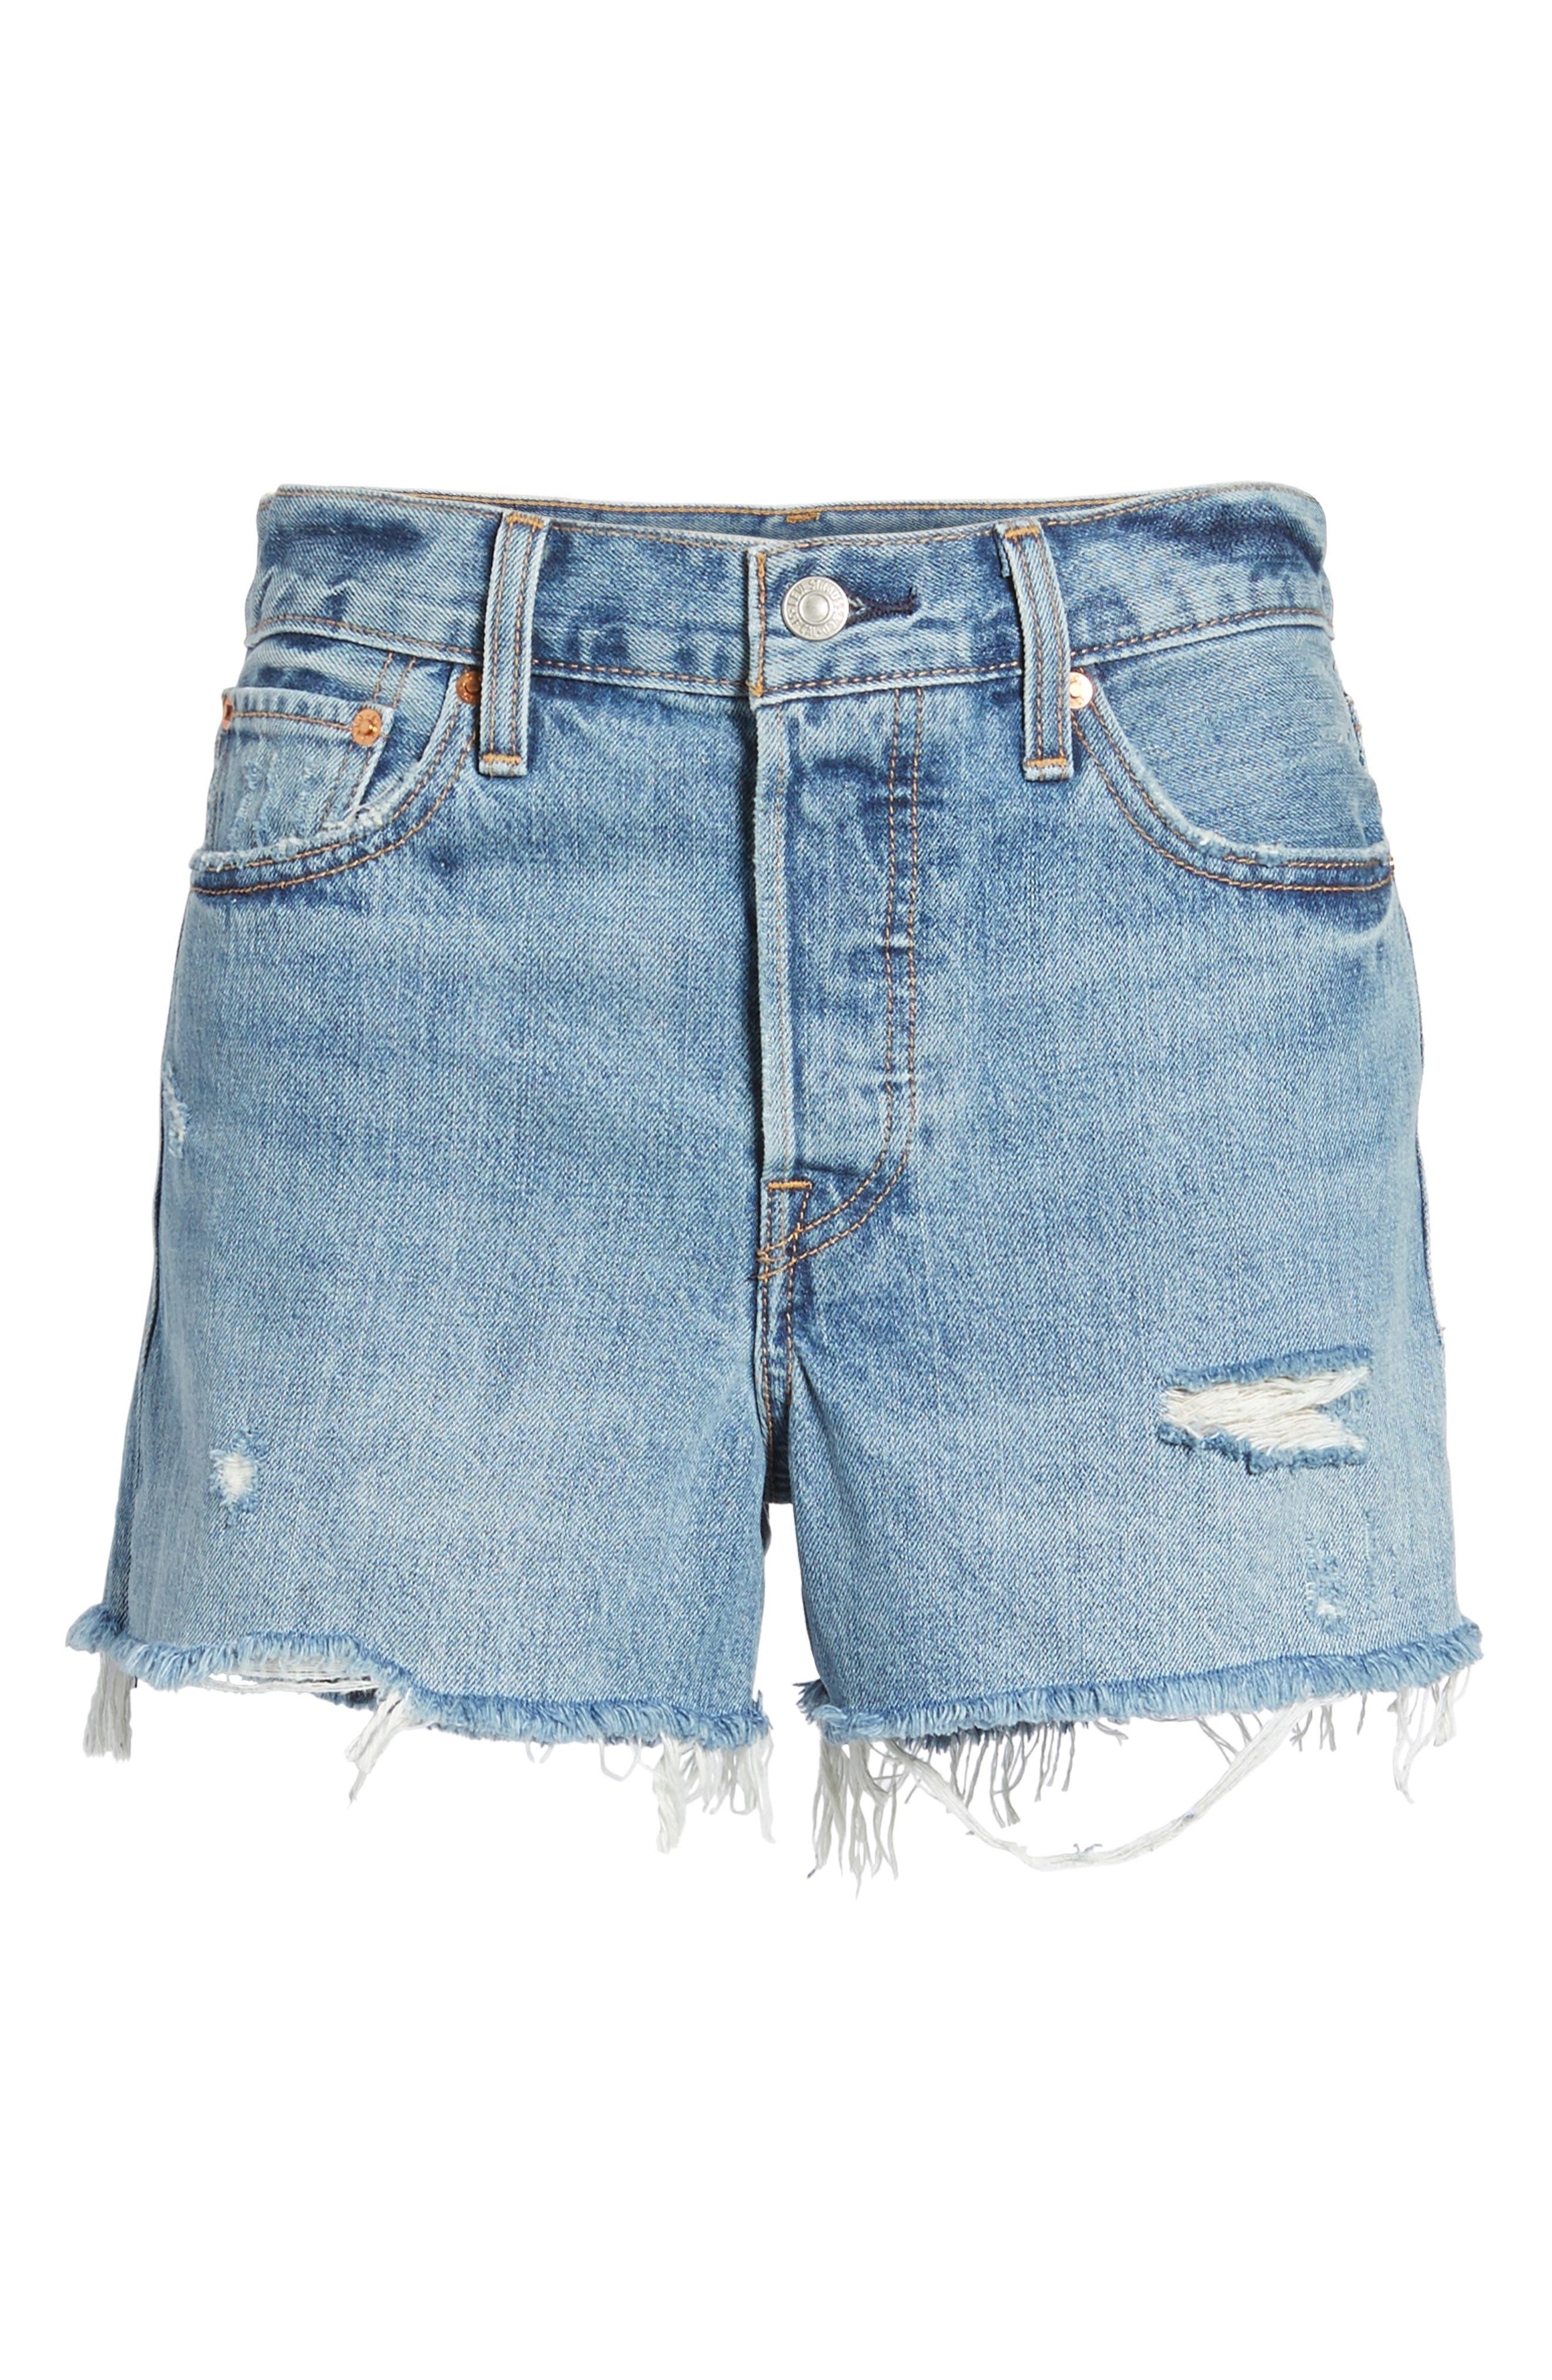 Wedgie High Waist Cutoff Denim Shorts,                             Alternate thumbnail 7, color,                             420